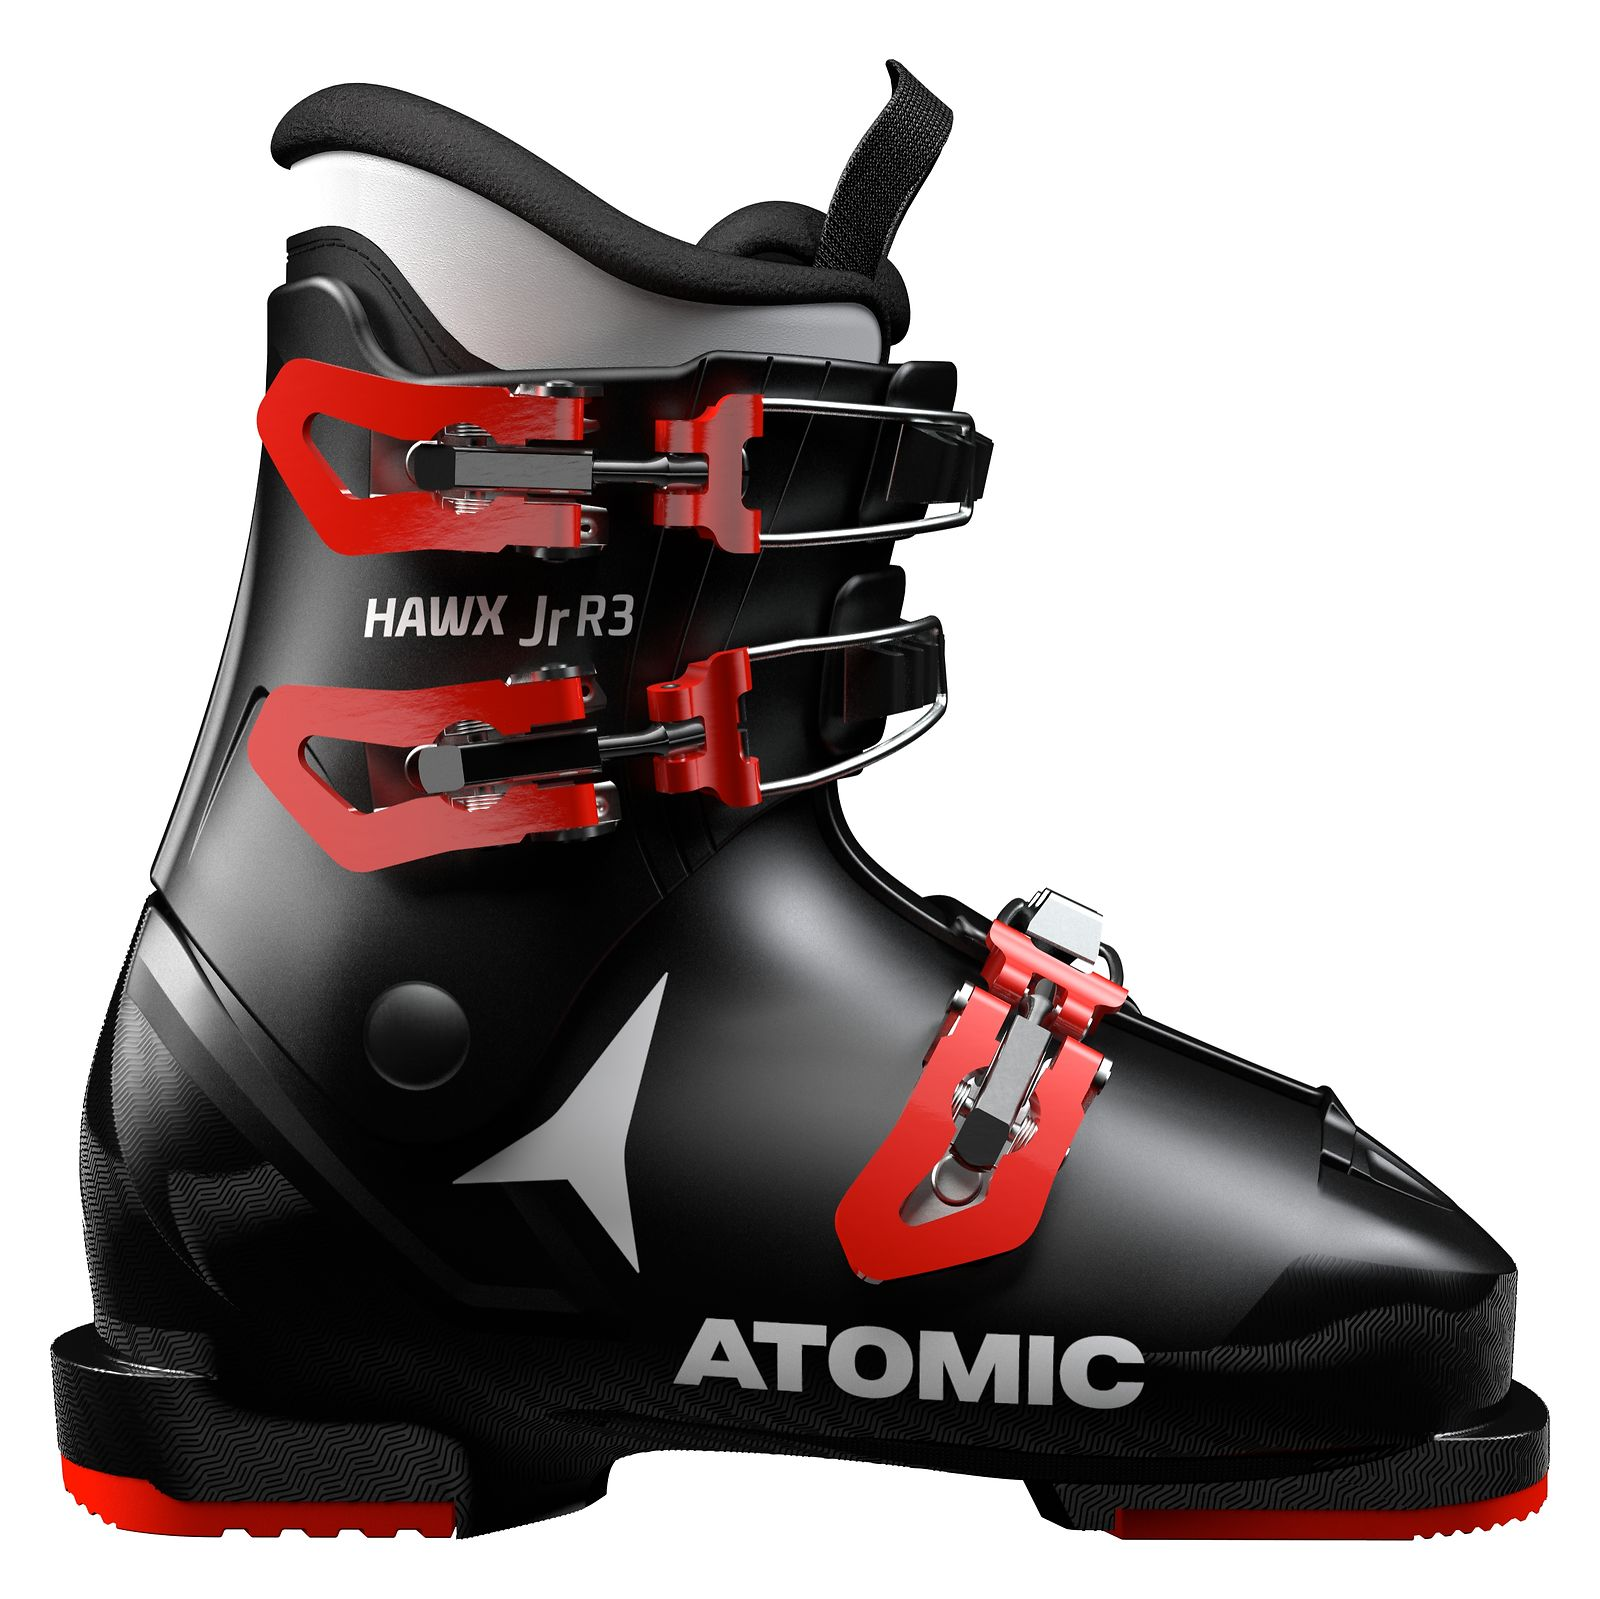 Buty narciarskie Atomic Hawx Jr3 R F40